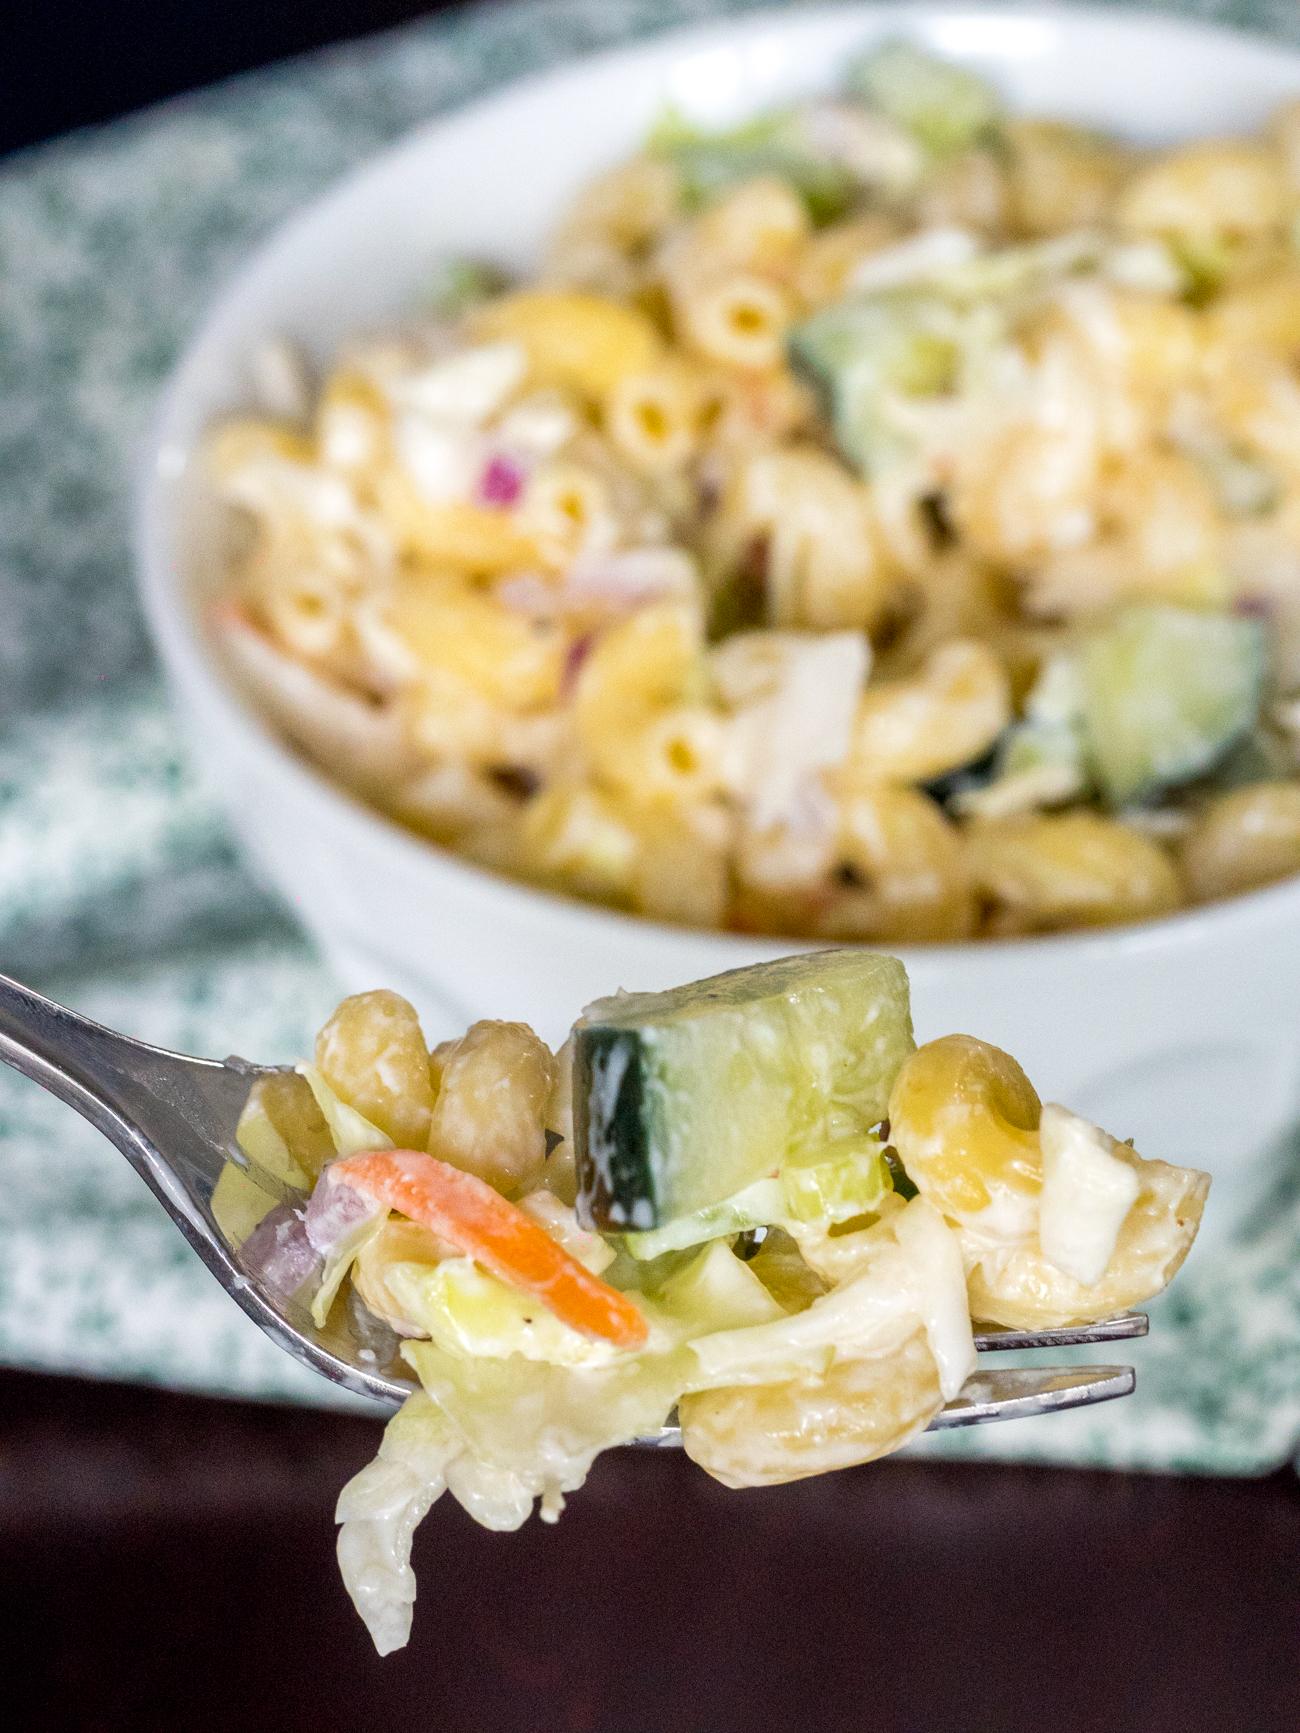 Macaroni Coleslaw Salad Vertical 2